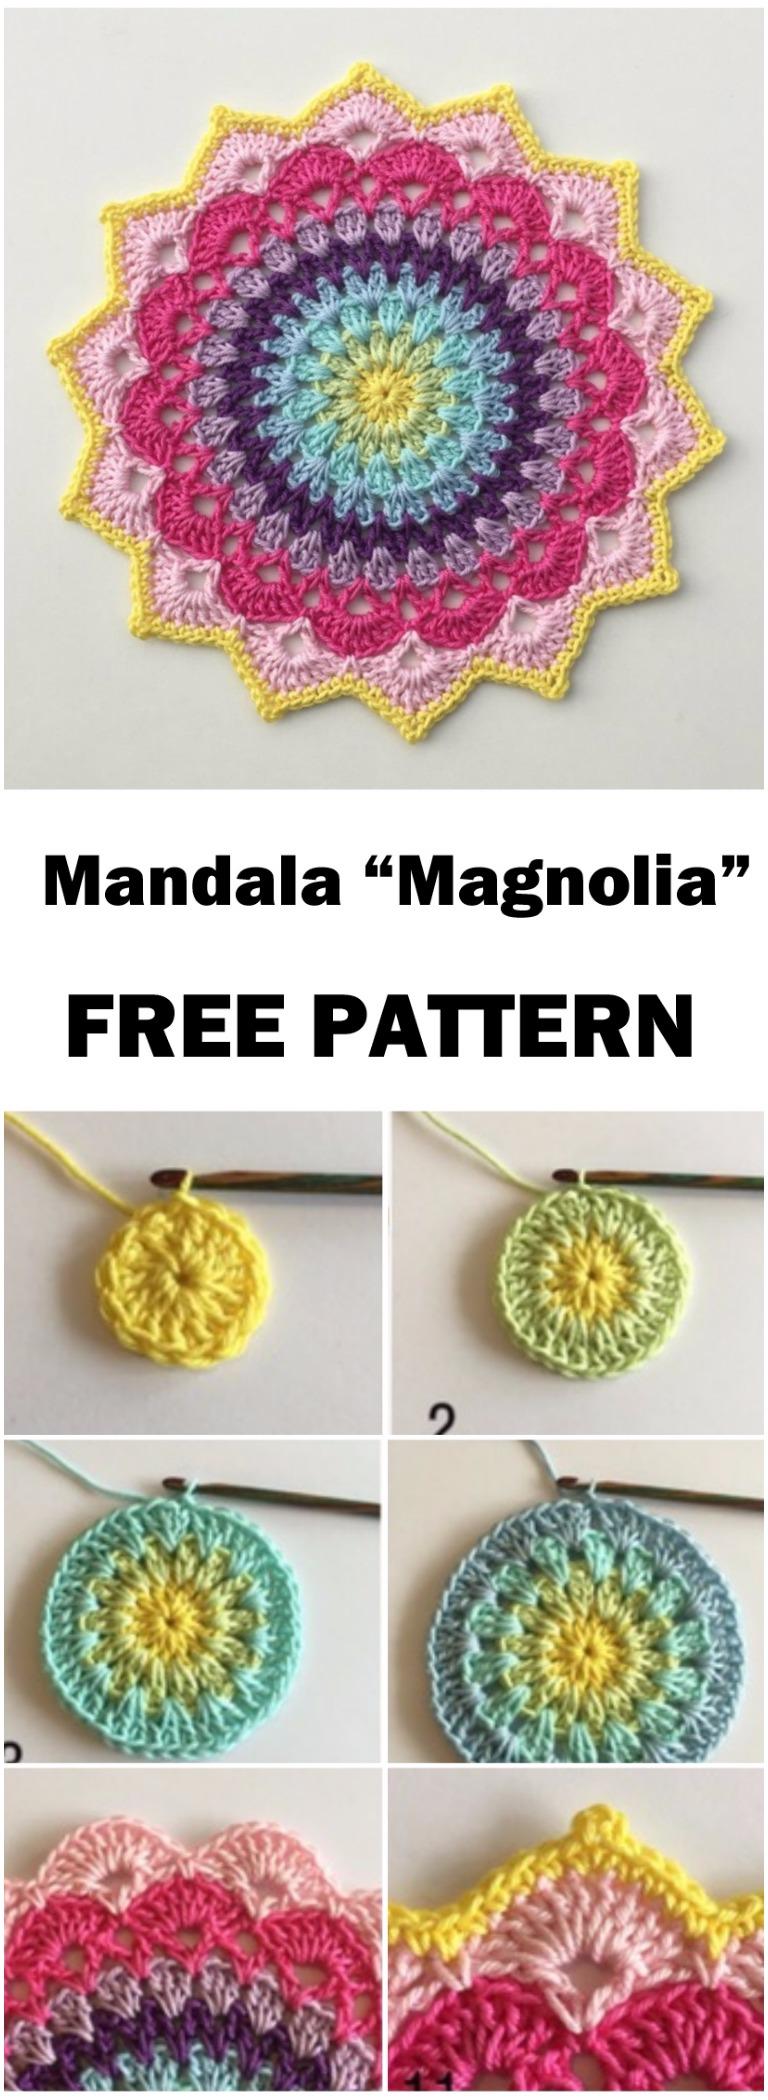 "Mandala ""Magnolia"" – Free Pattern"